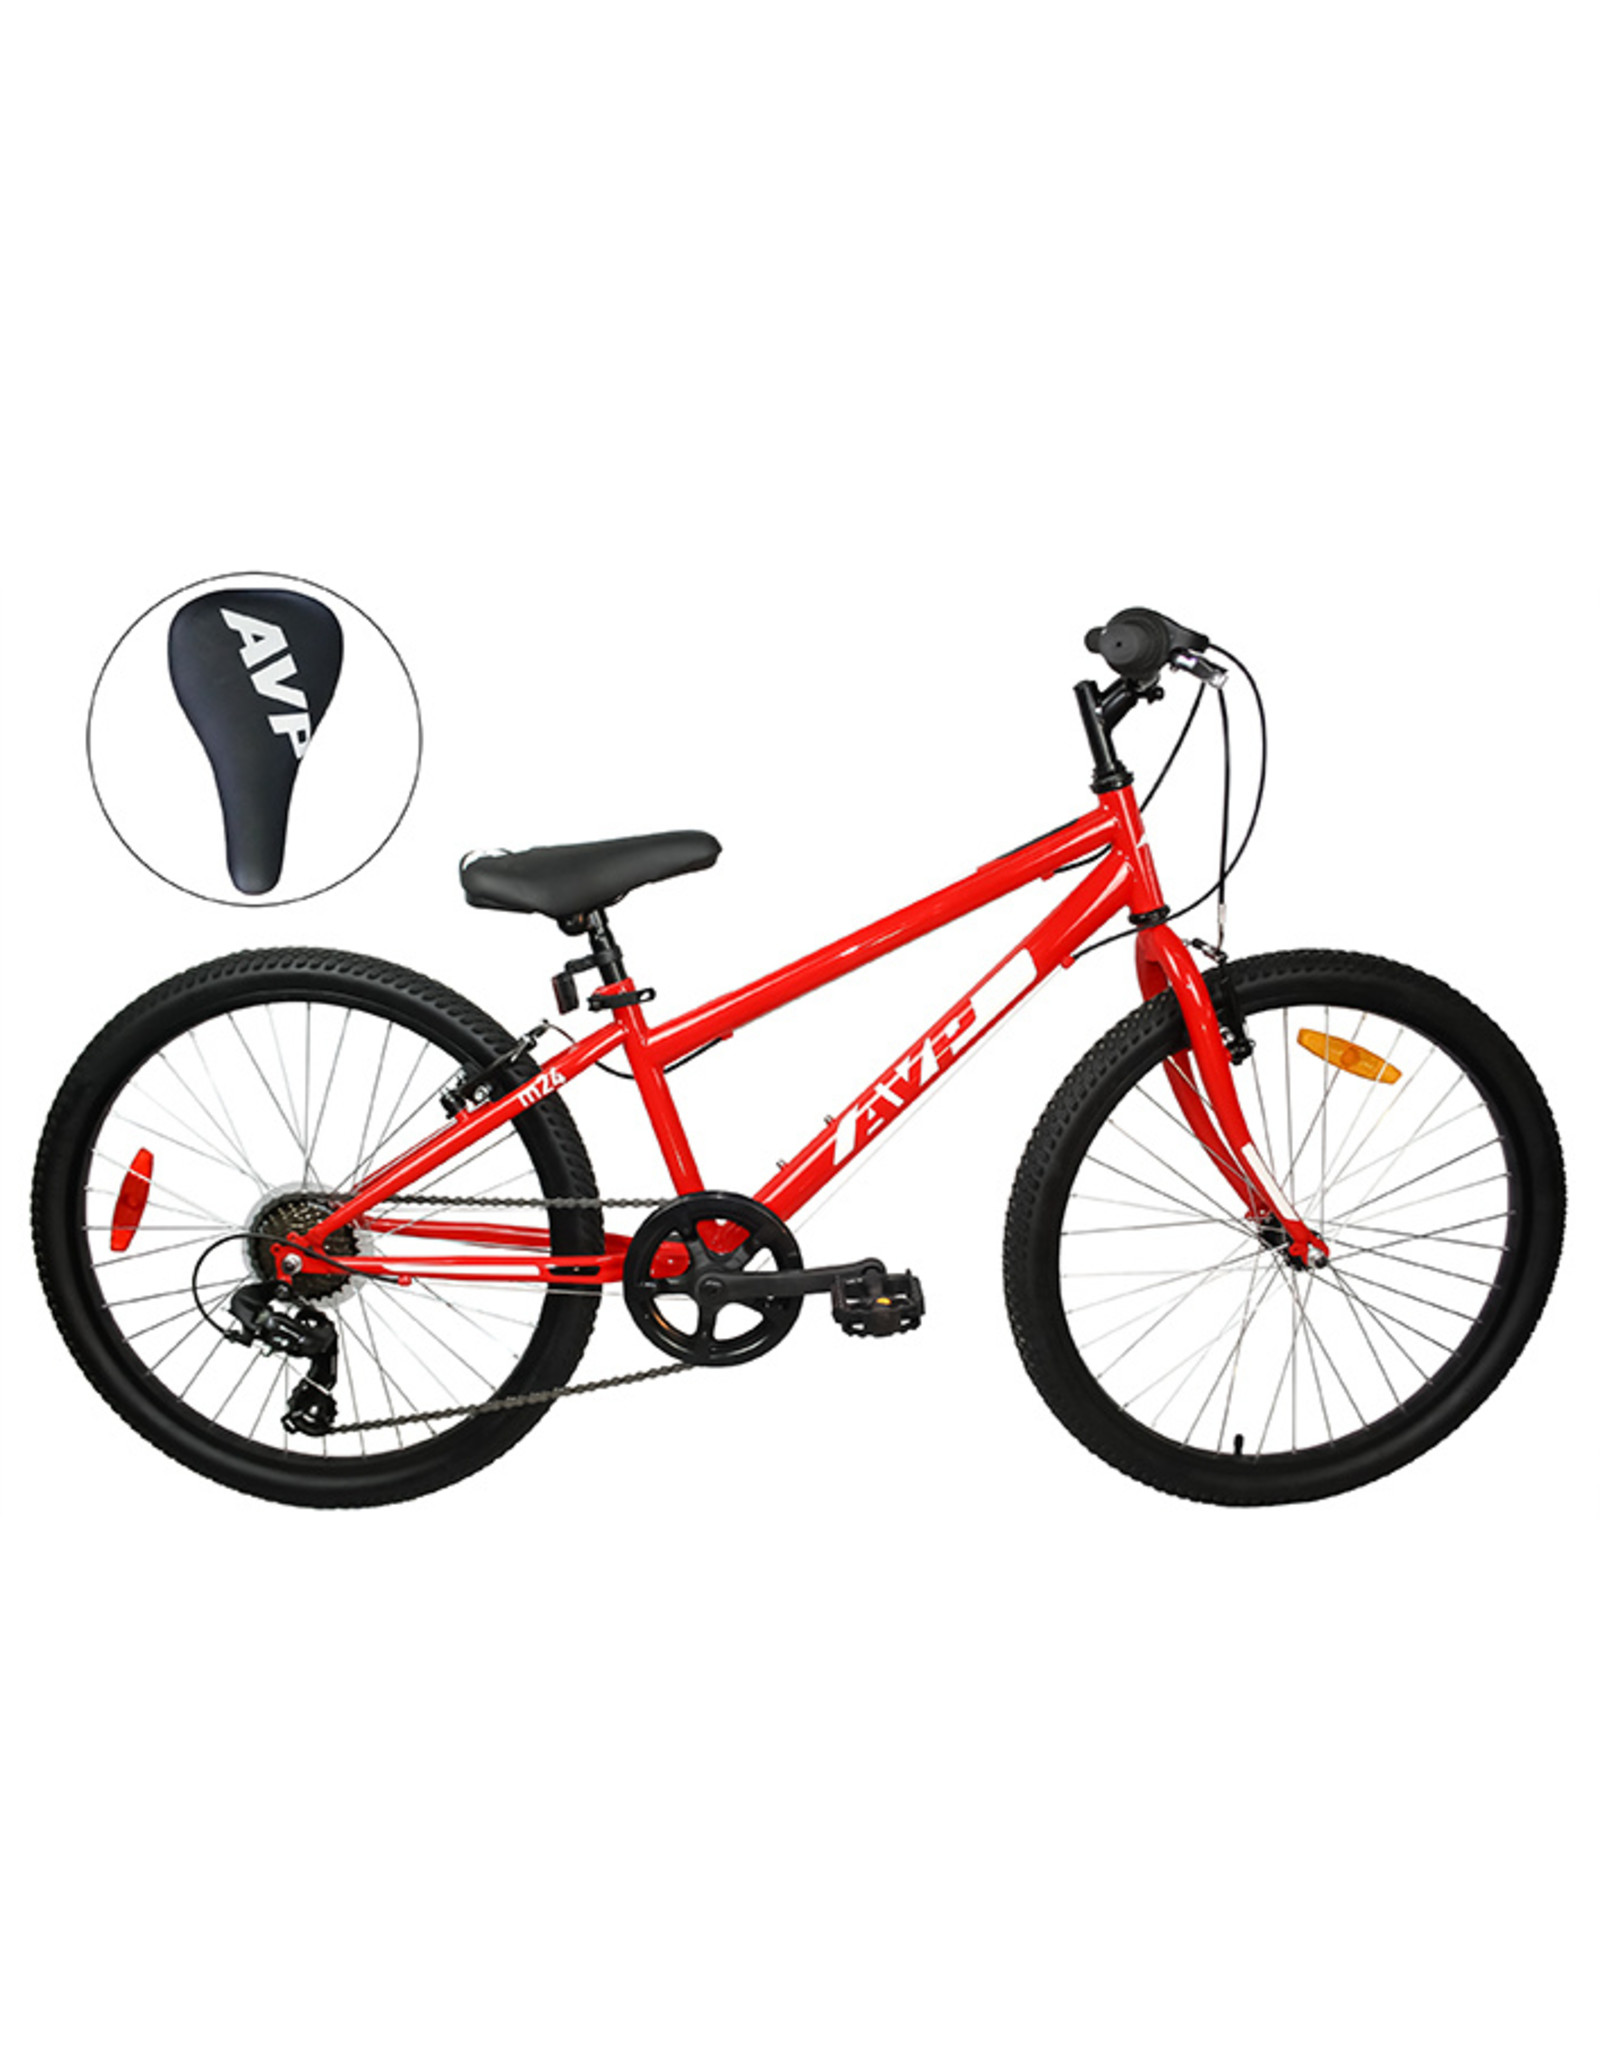 Vélo junior AVP M24 21 vitesses Rouge/Blanc